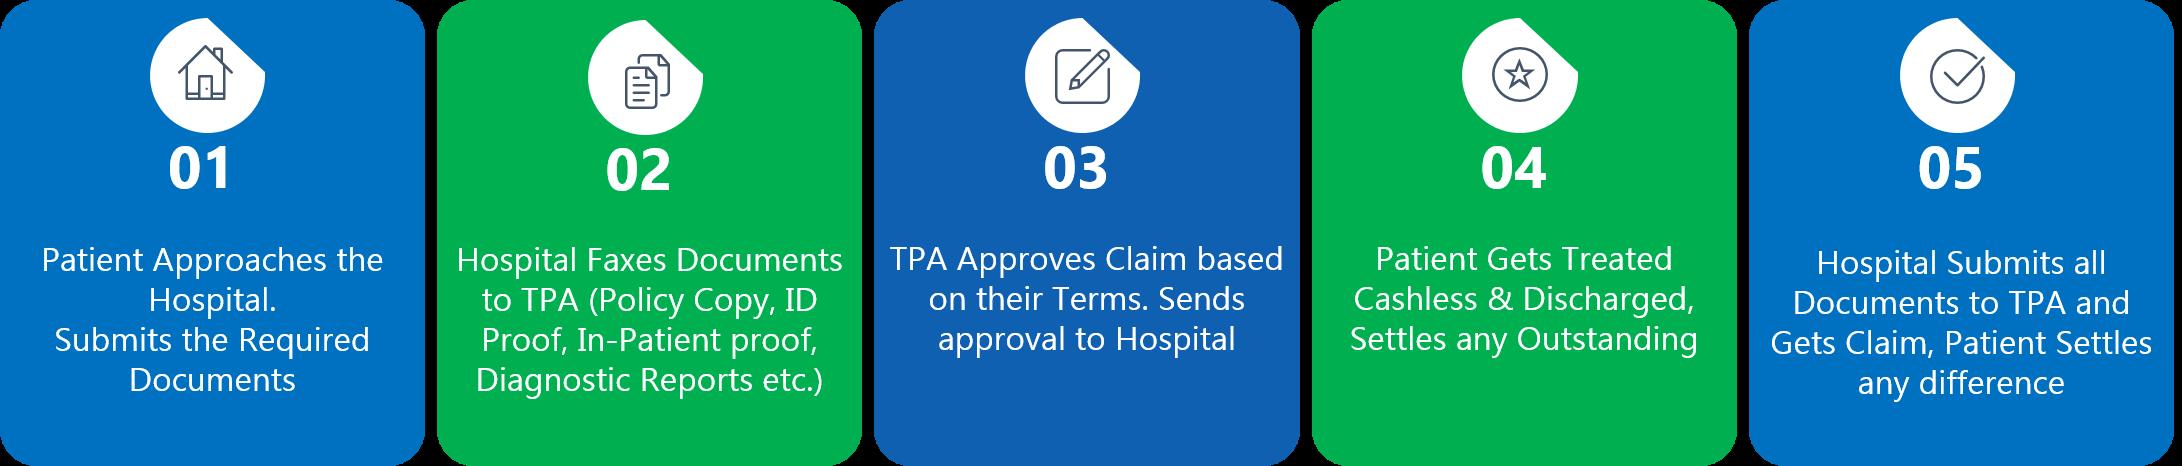 Cashless Hospital Insurance TPA Facility Chromepet Chennai Dr Kumars Multi Speciality Hospital